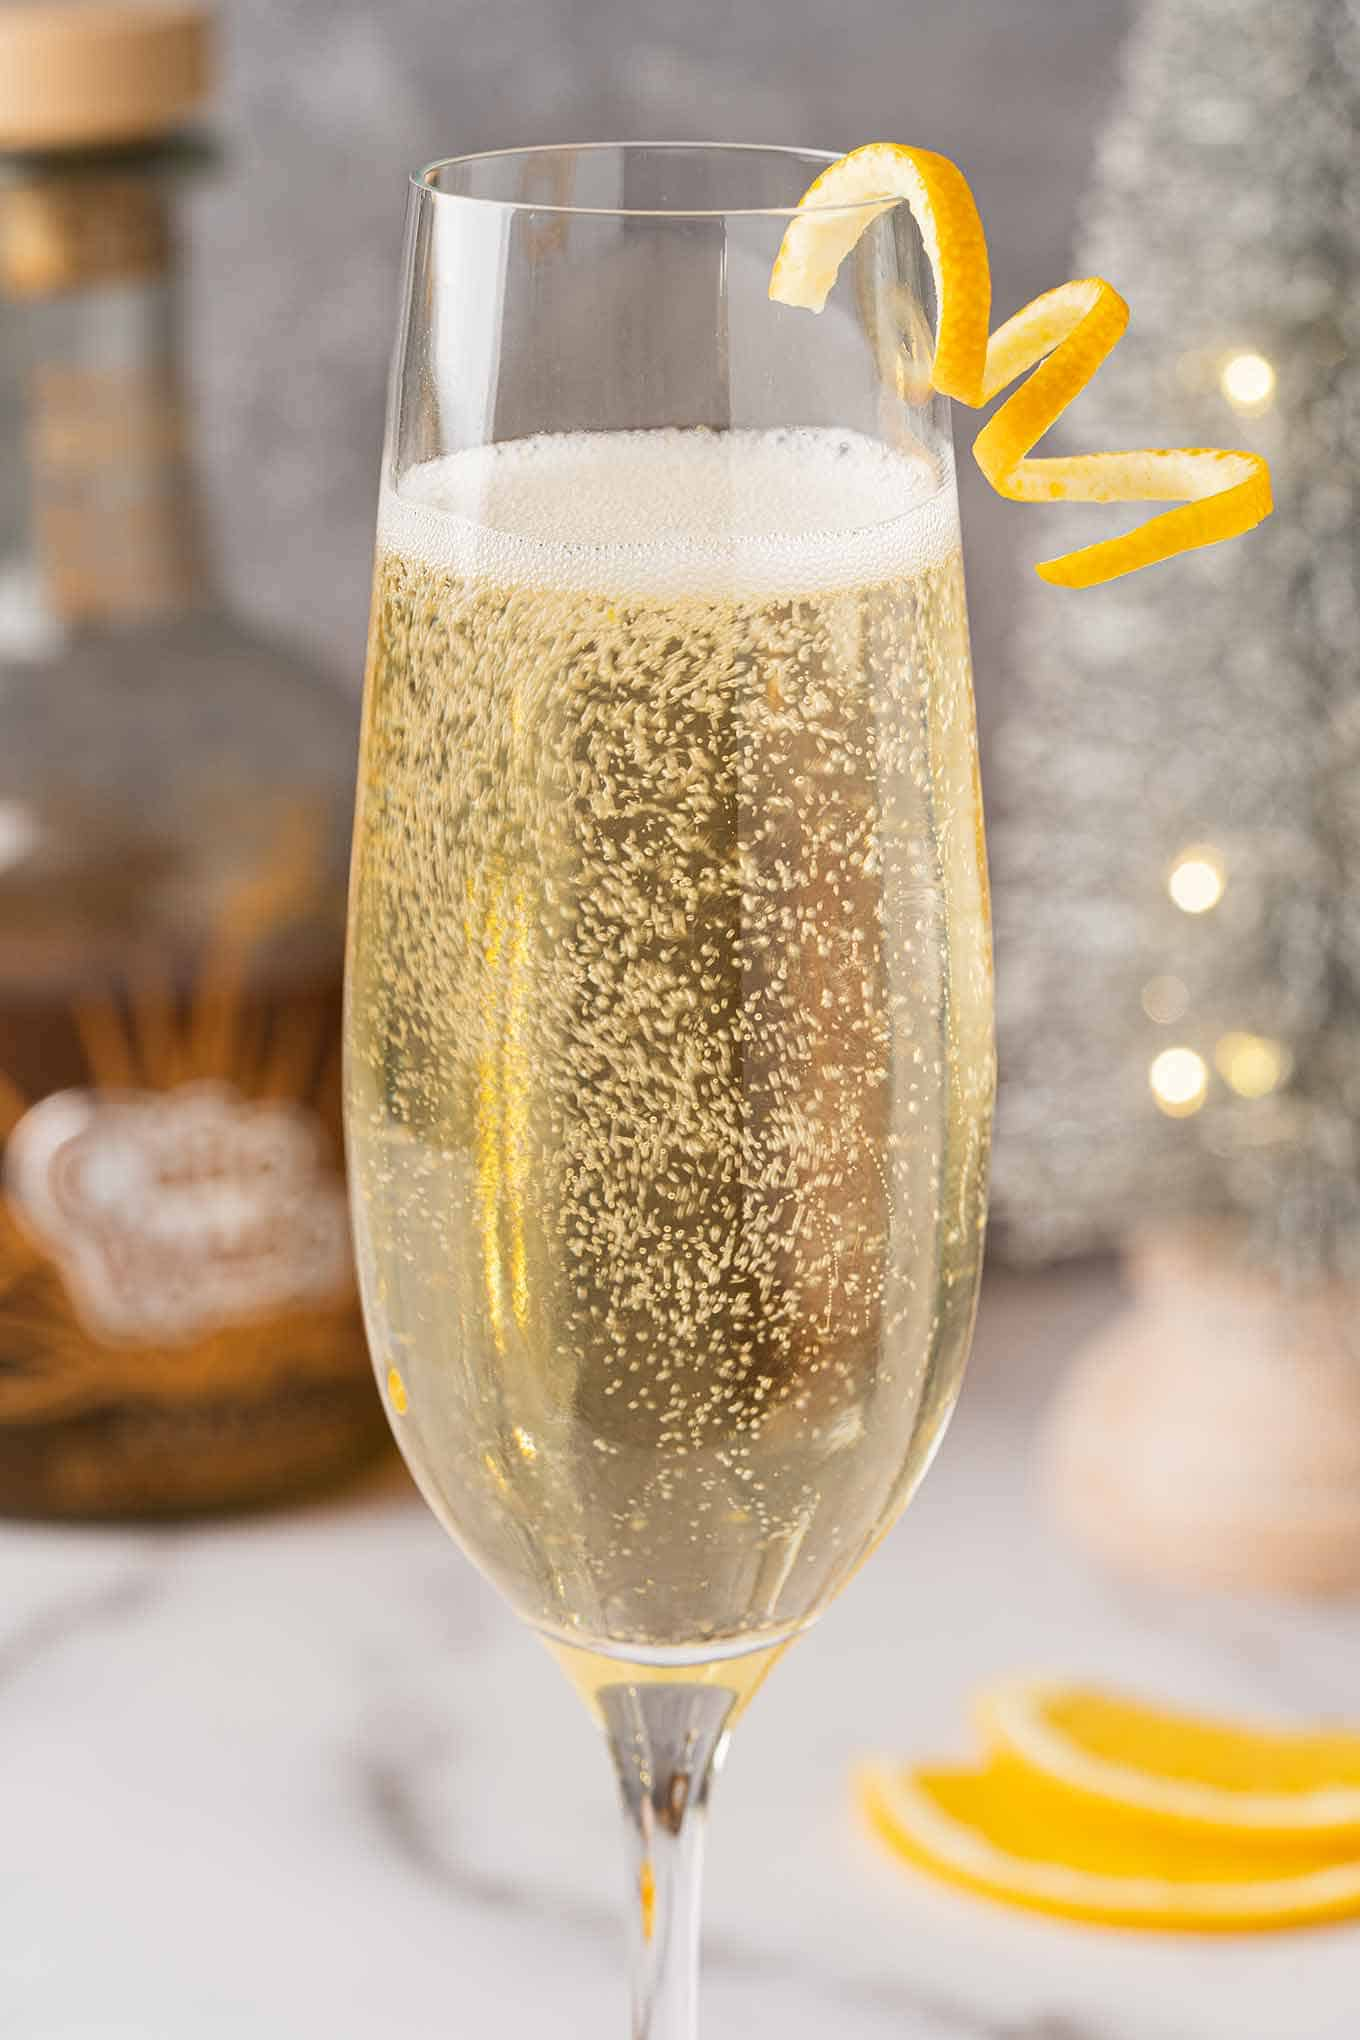 Sparkling wine cocktail in a champagne flute garnished with an orange twist, orange slices.